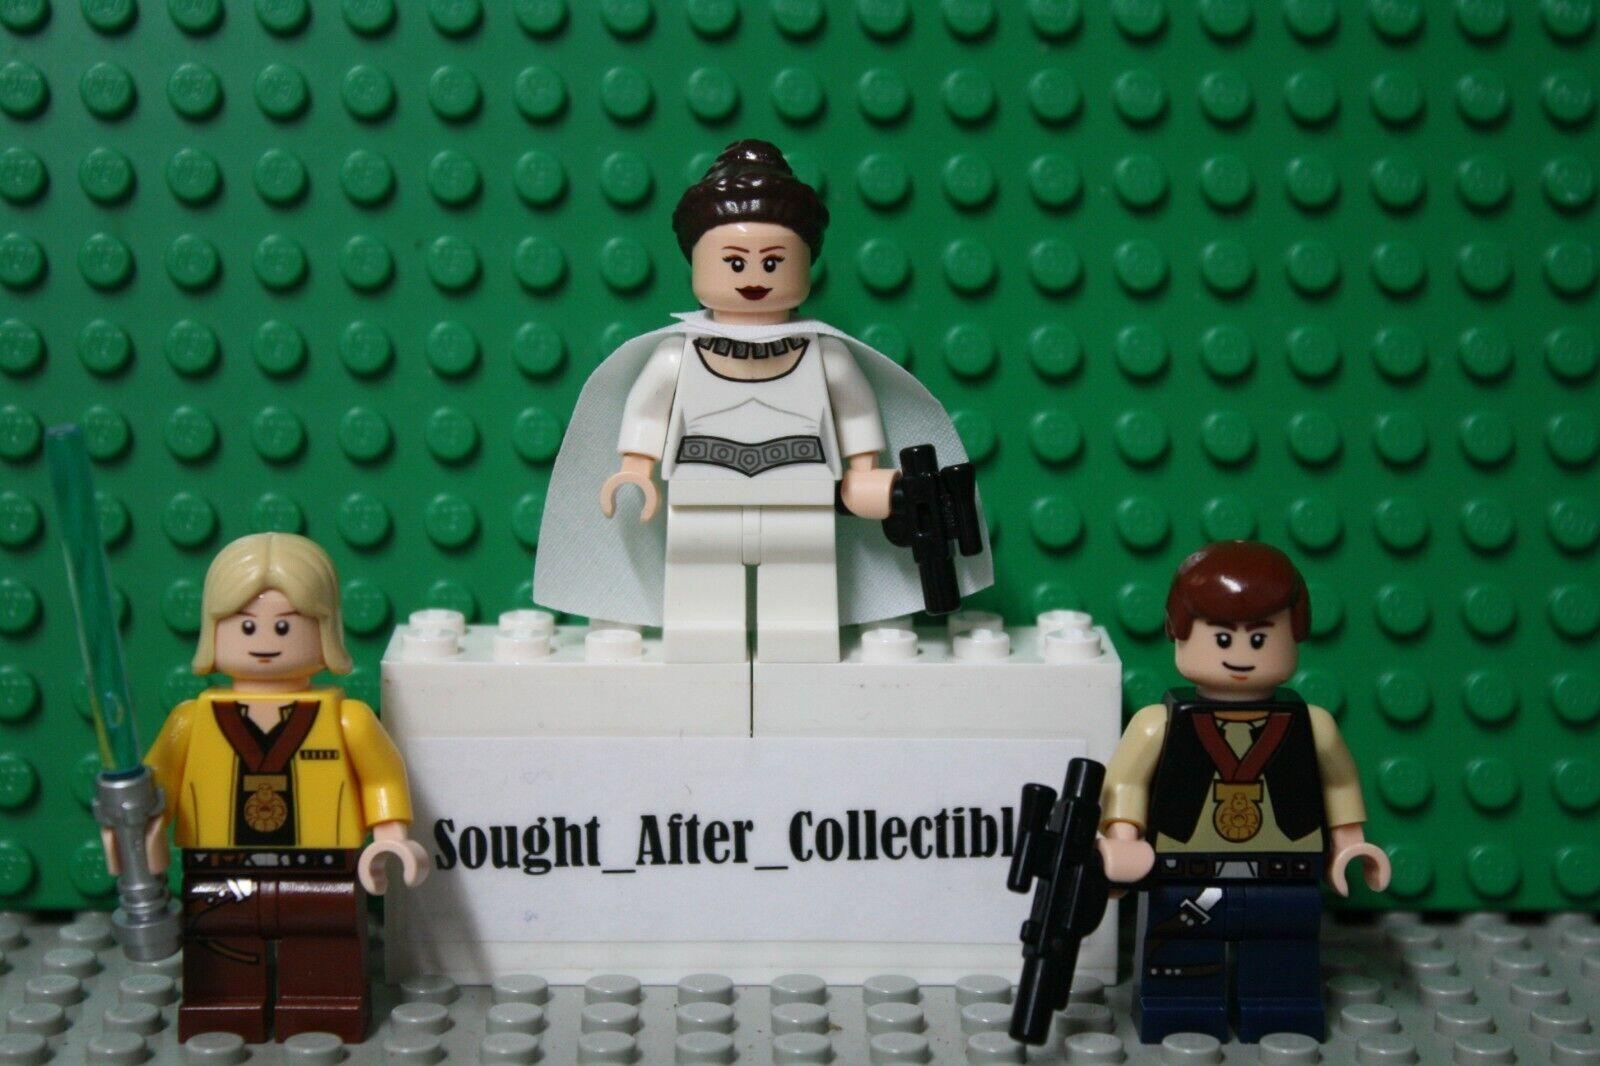 Lego  Star Wars Yavin médaille cérémonie Leia Luke Skywalker et Han Solo Authentique  acheter pas cher